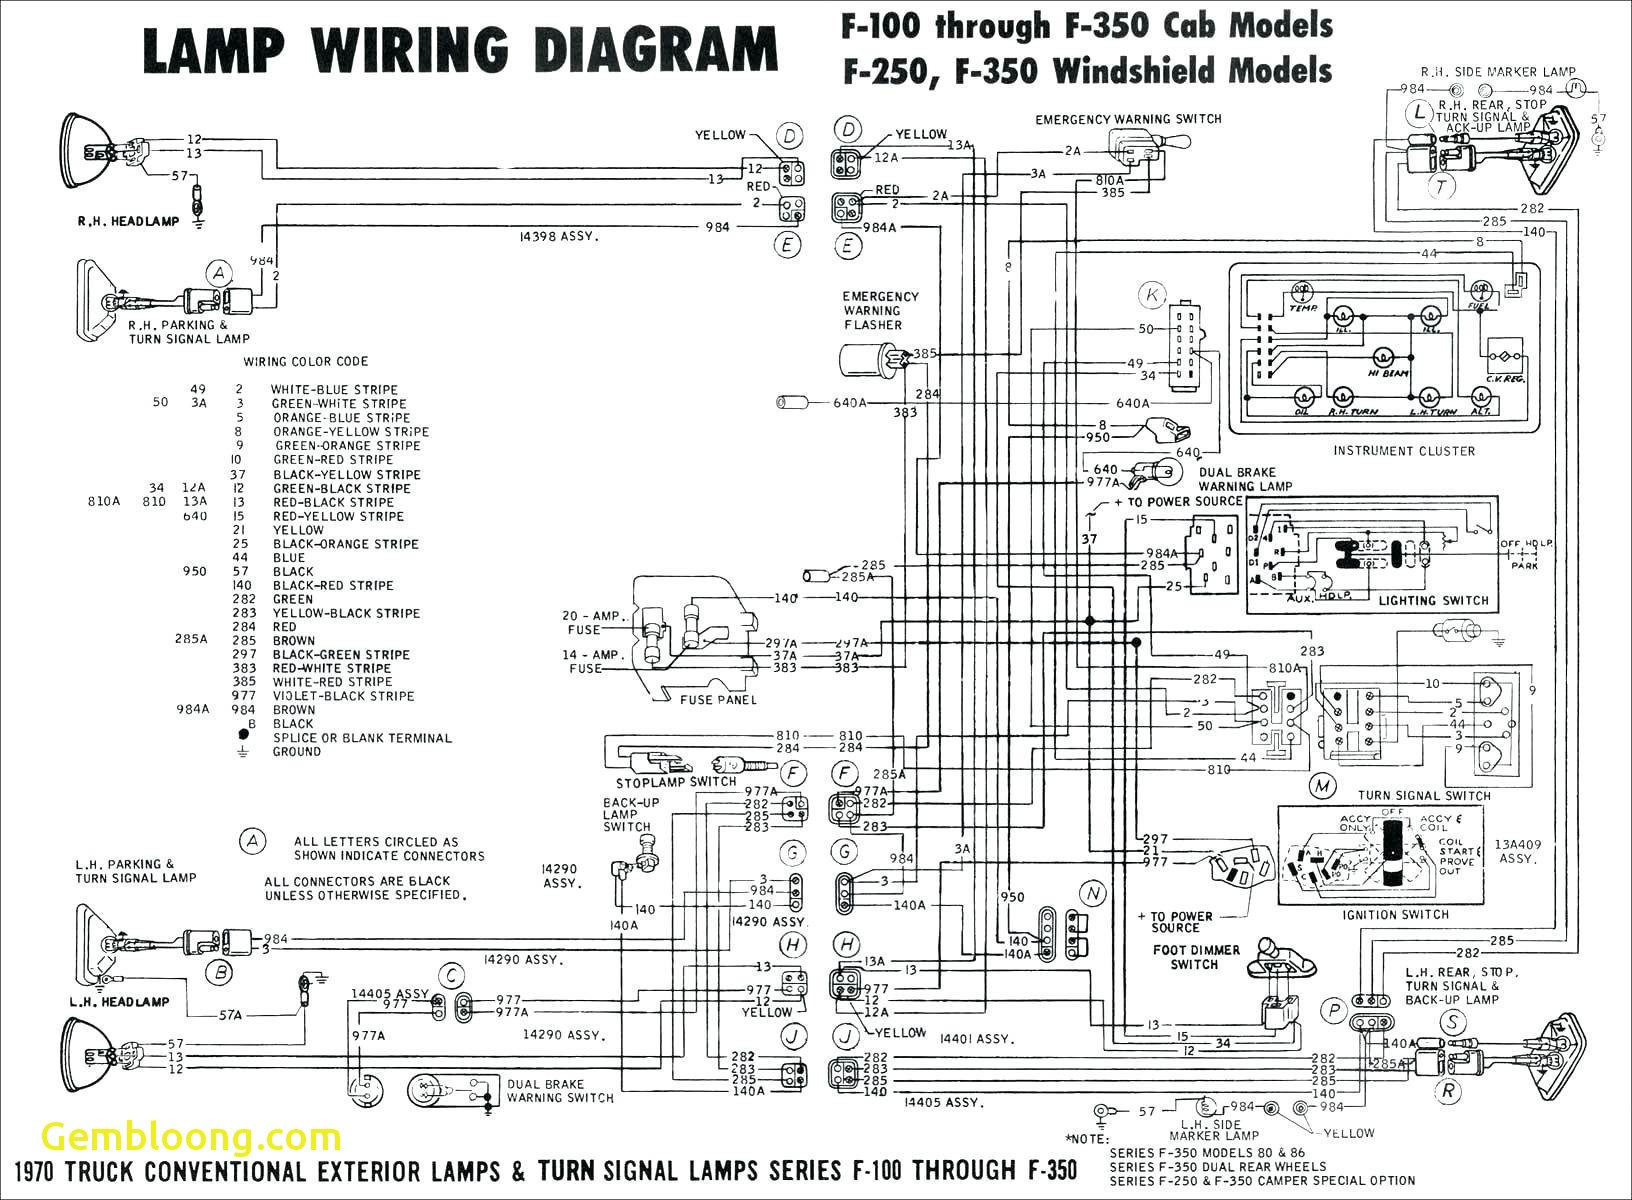 boat wiring diagram legend wiring diagram posts Home Wiring Diagram Symbols